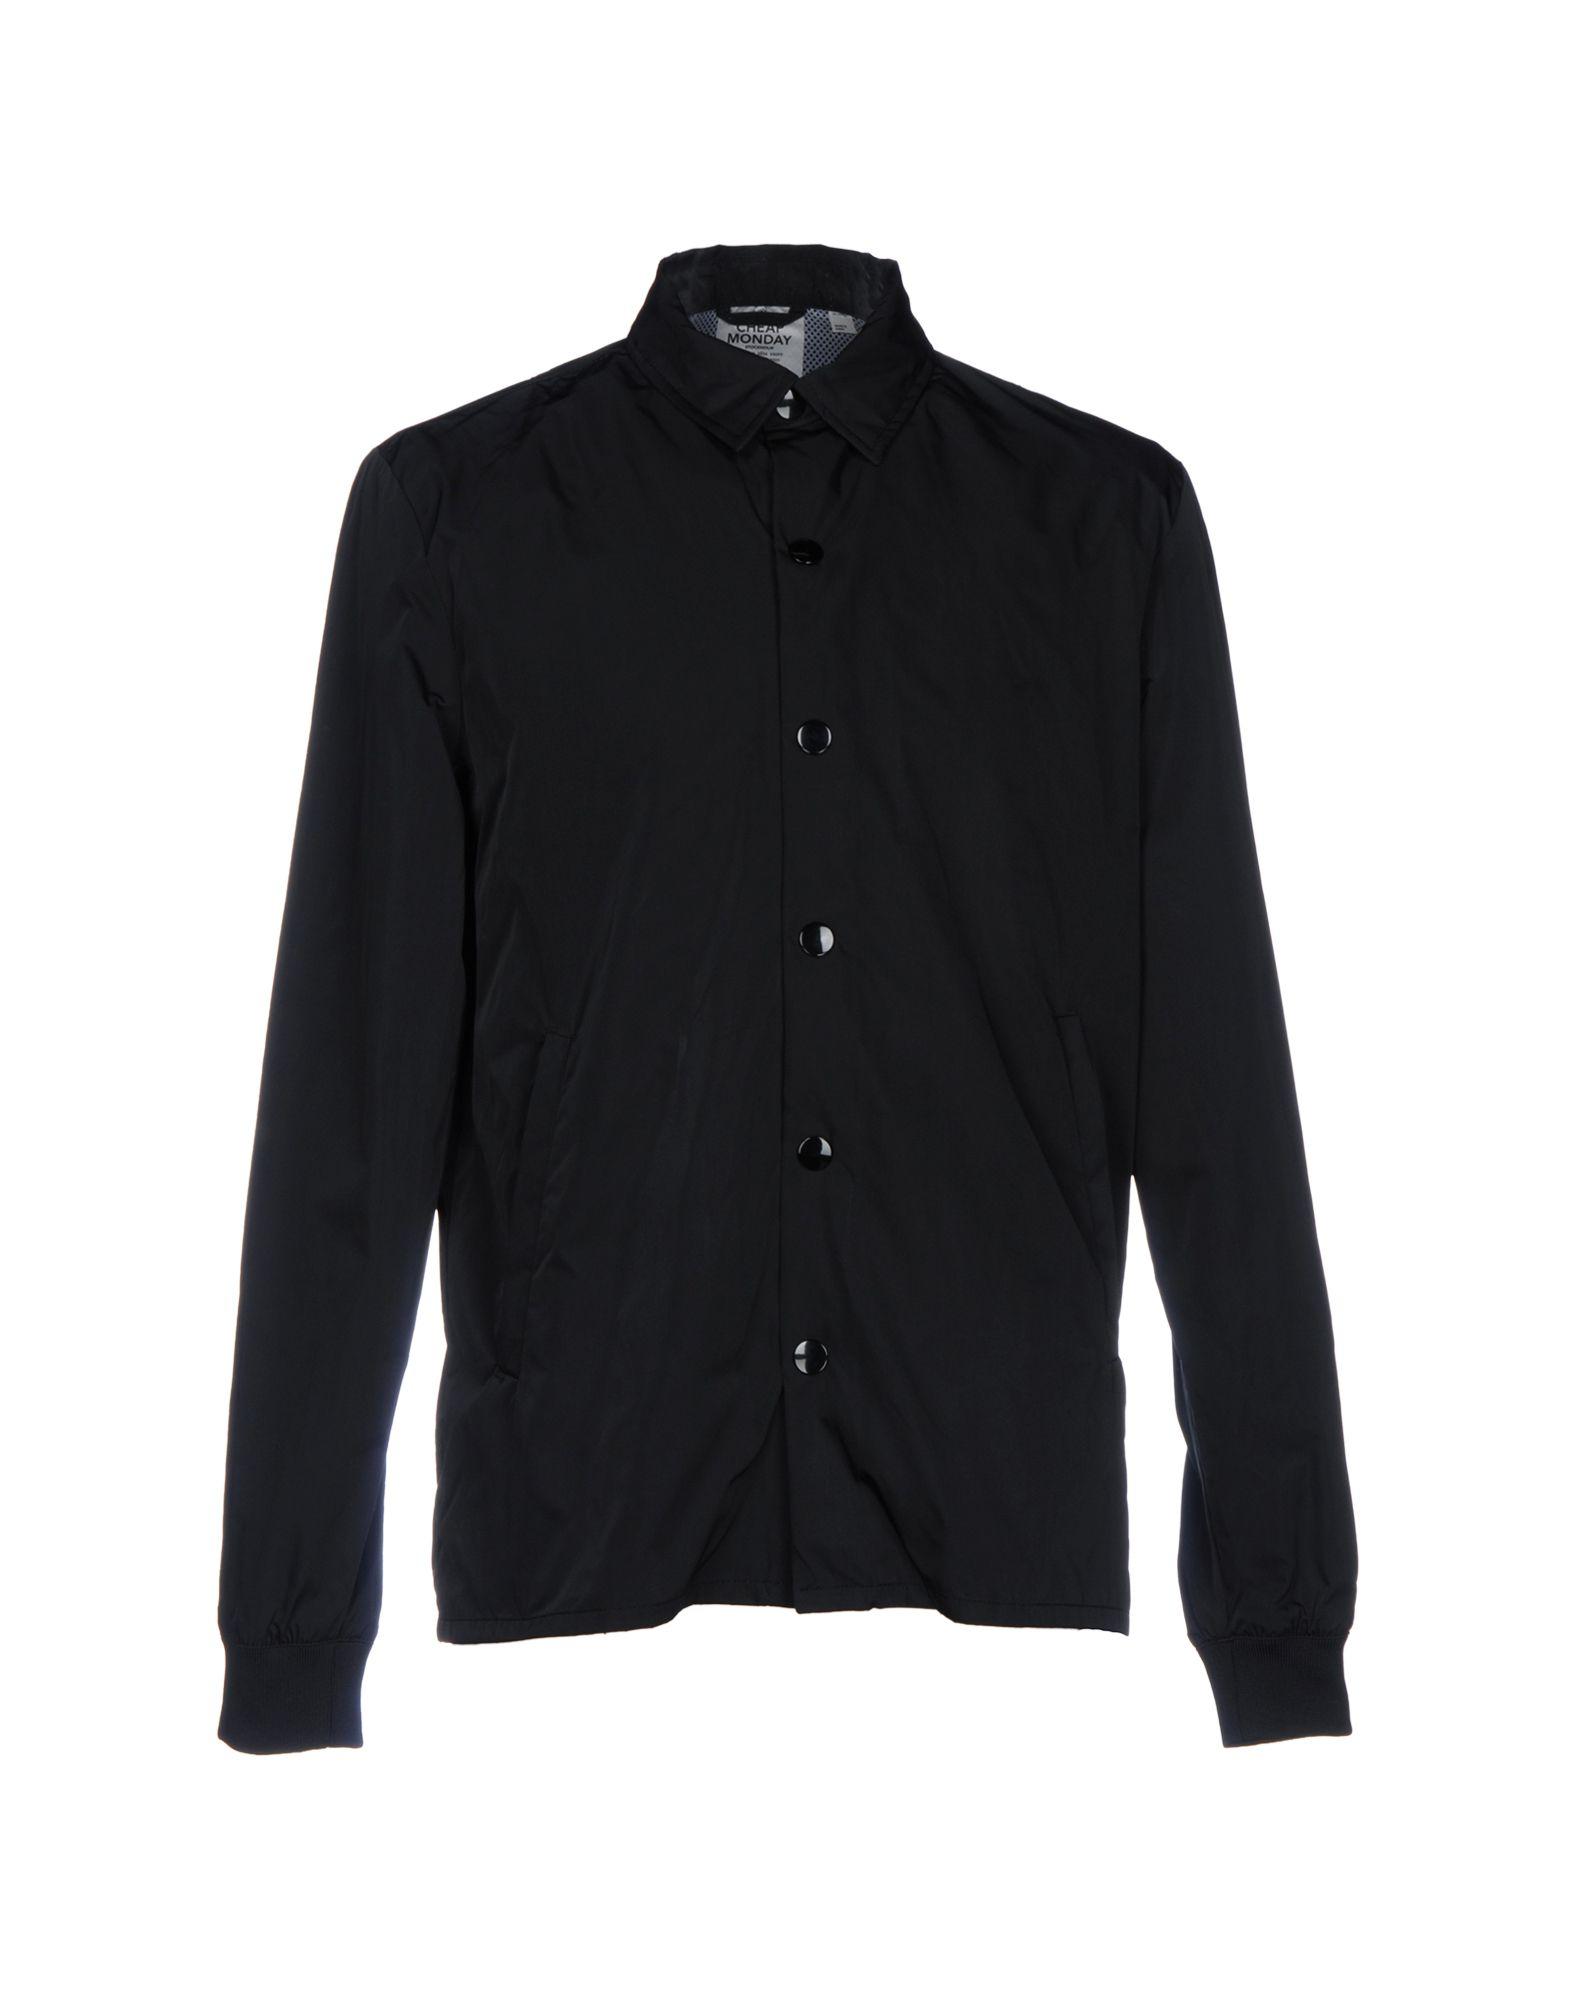 CHEAP MONDAY Куртка cheap monday джинсовая верхняя одежда